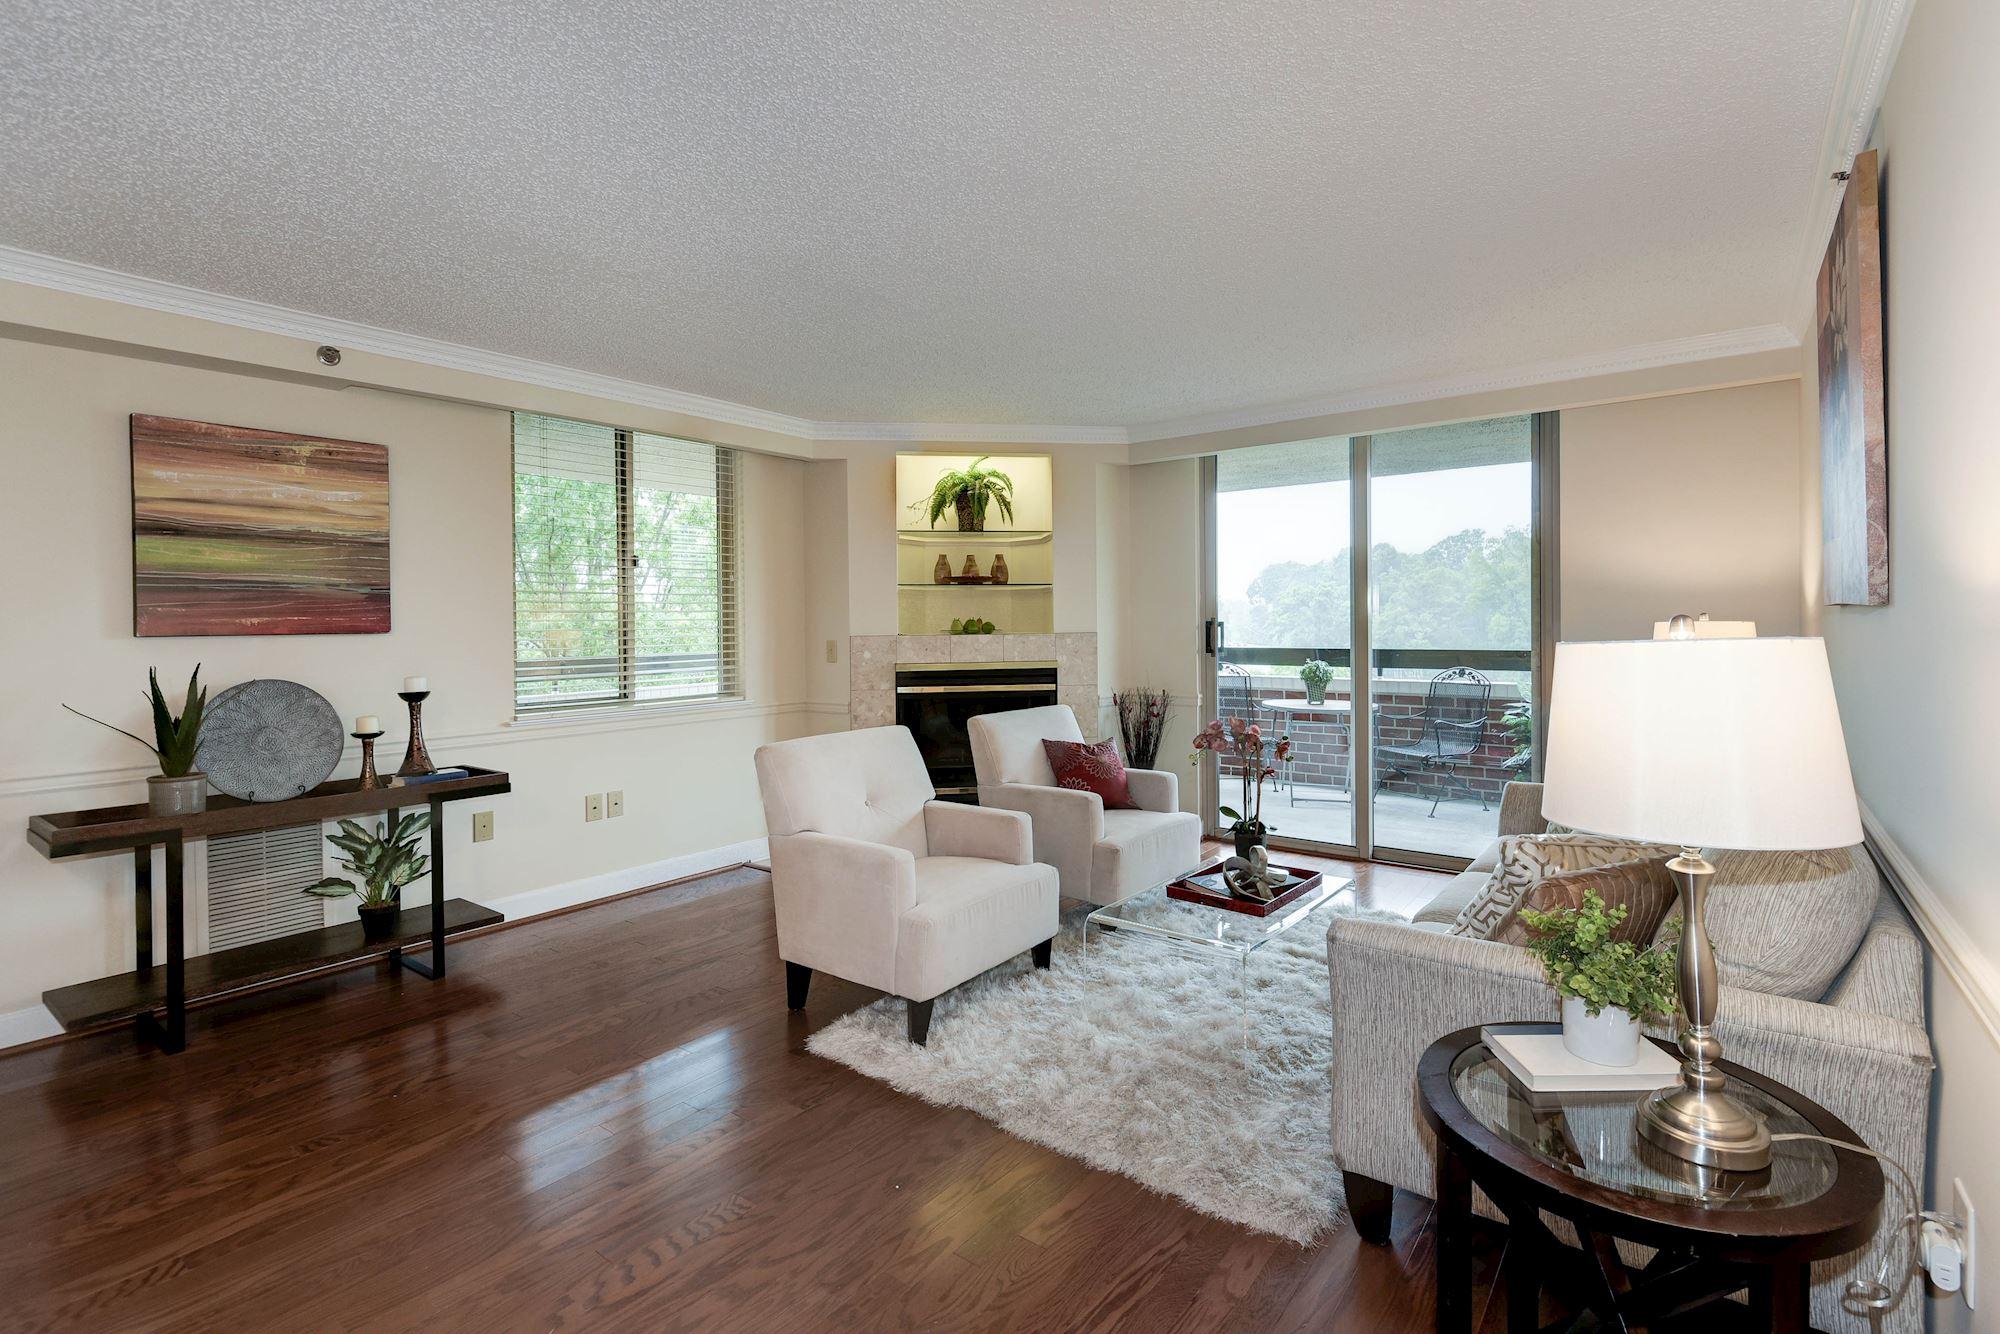 Sunny Living Room Wnew Hdwd Floor